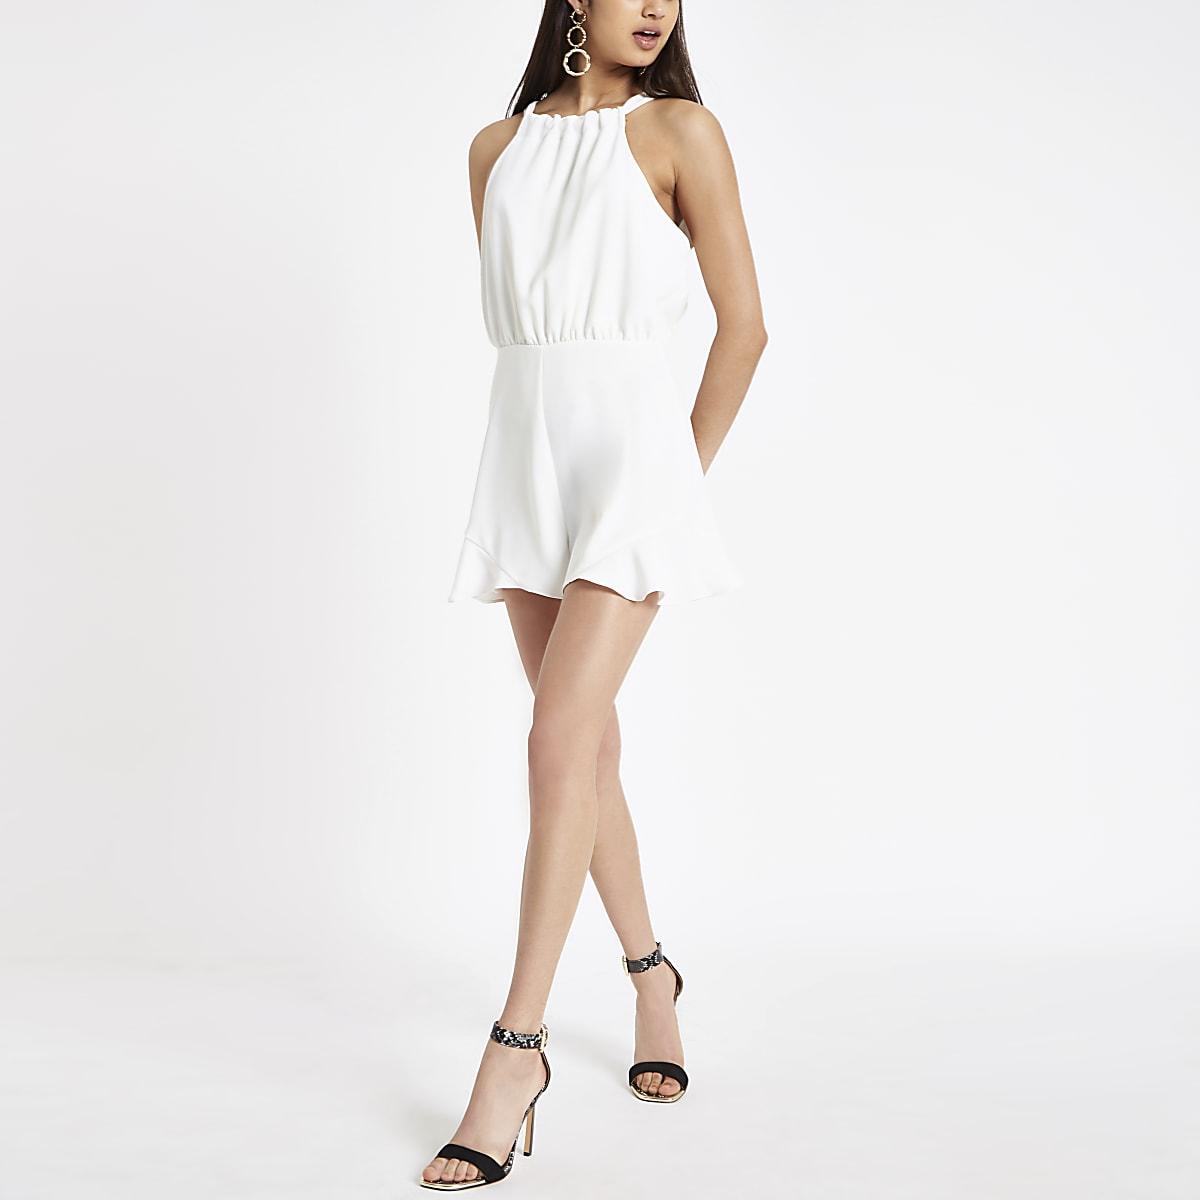 cc4df27cb3 White frill trim playsuit - Playsuits - Playsuits & Jumpsuits - women